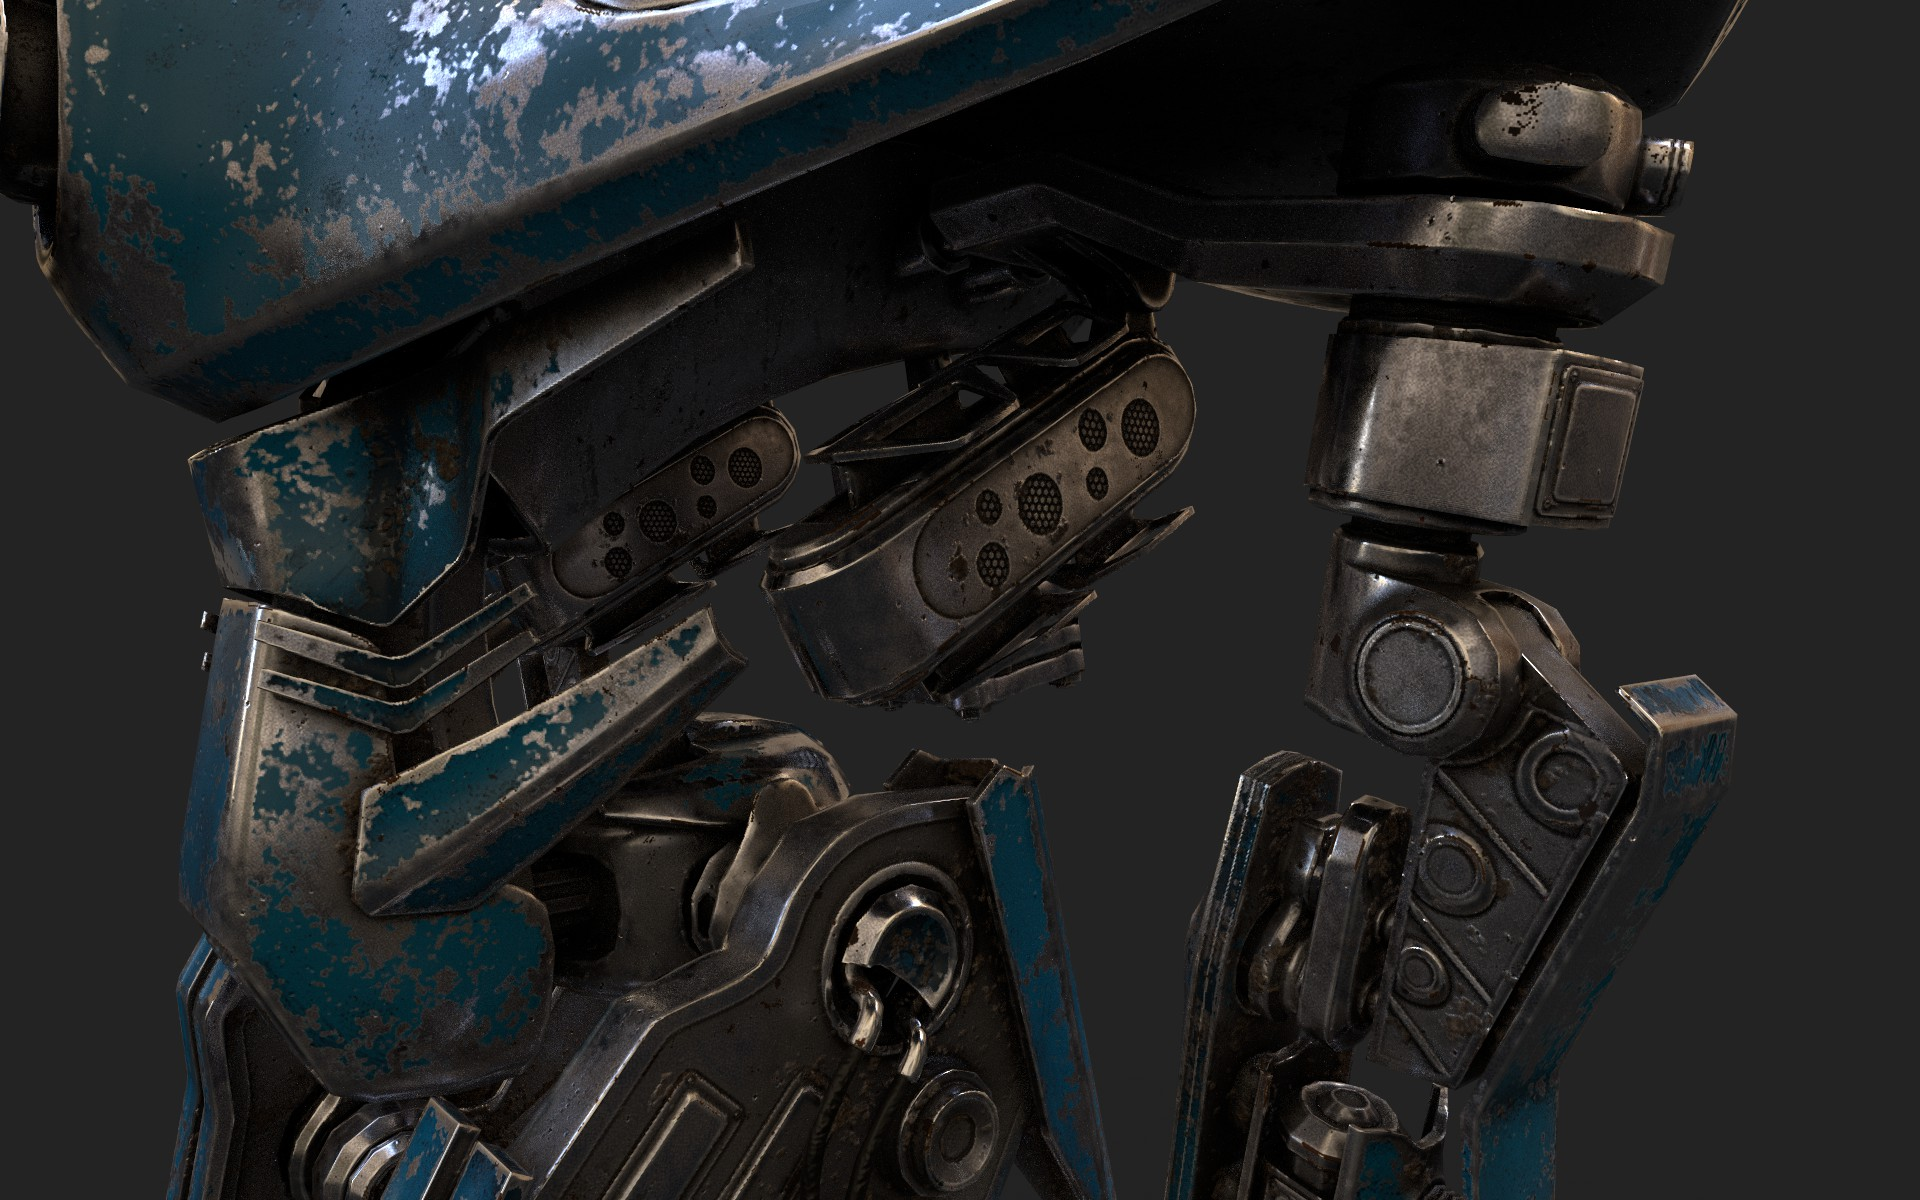 heavy robot vex700 3d model 3ds max fbx obj 279582